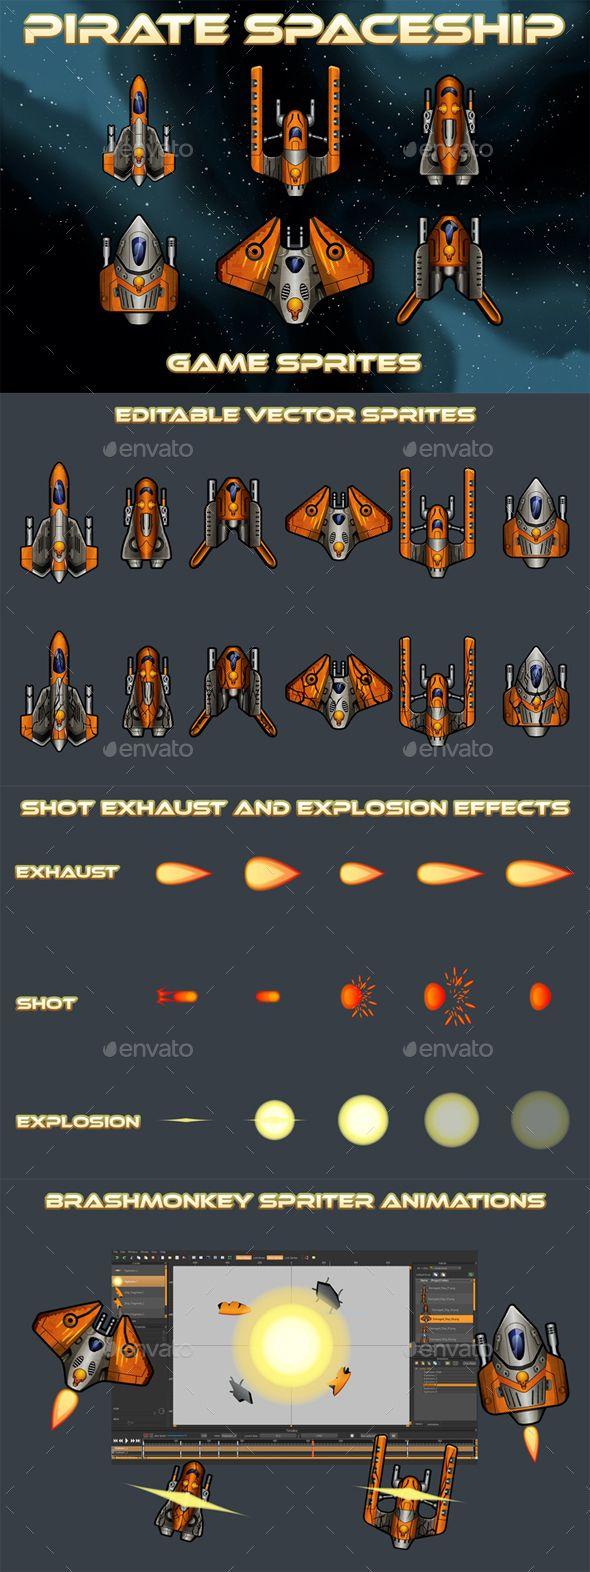 Pirate Spaceship 2D Sprites Sprites Game Assets Download